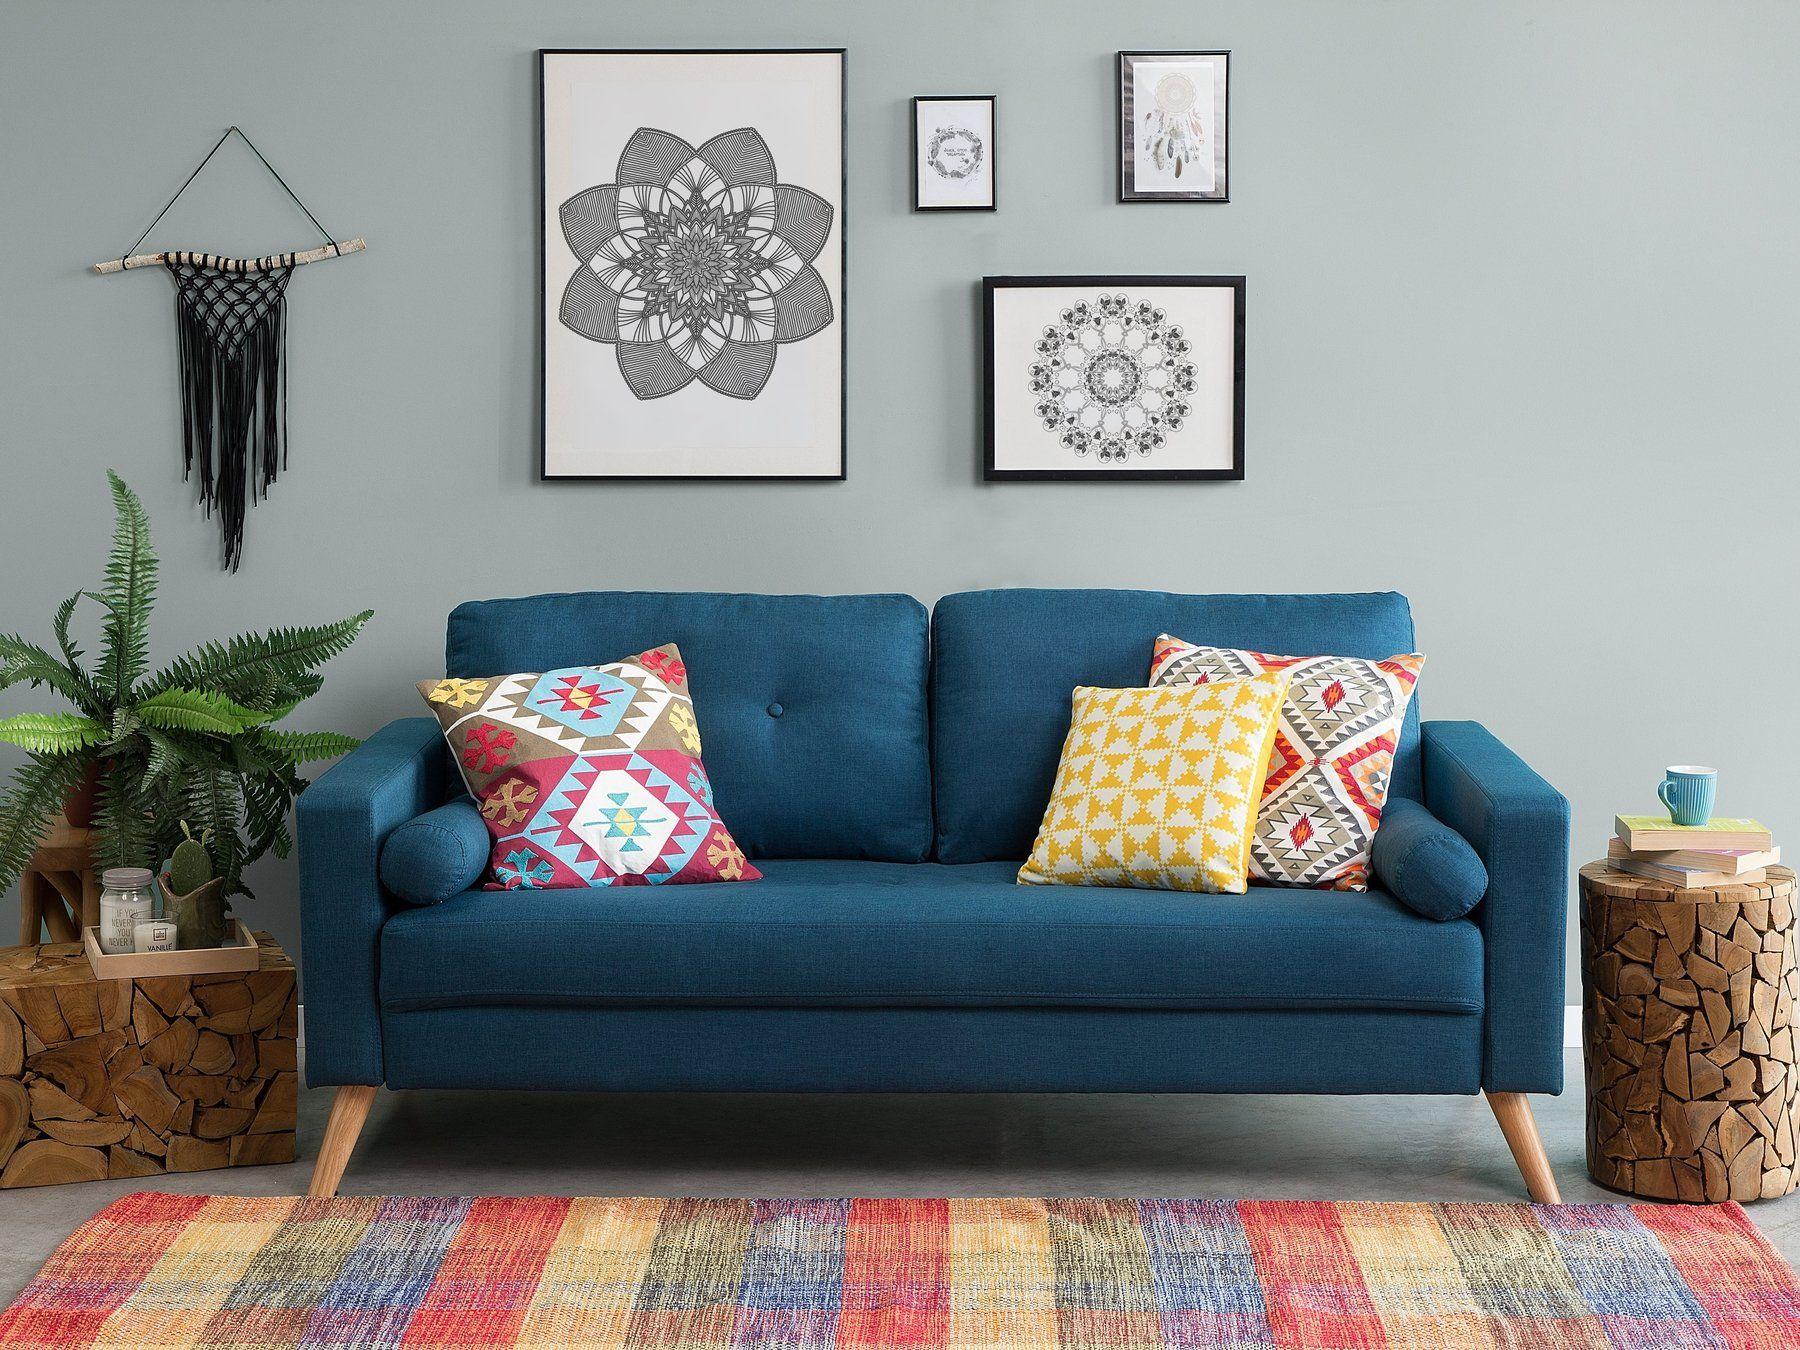 Schlafsofa Polsterbezug Kobaltblau Ronne Wohnkultur Schlafzimmer Sofa Stoff 2 Sitzer Sofa